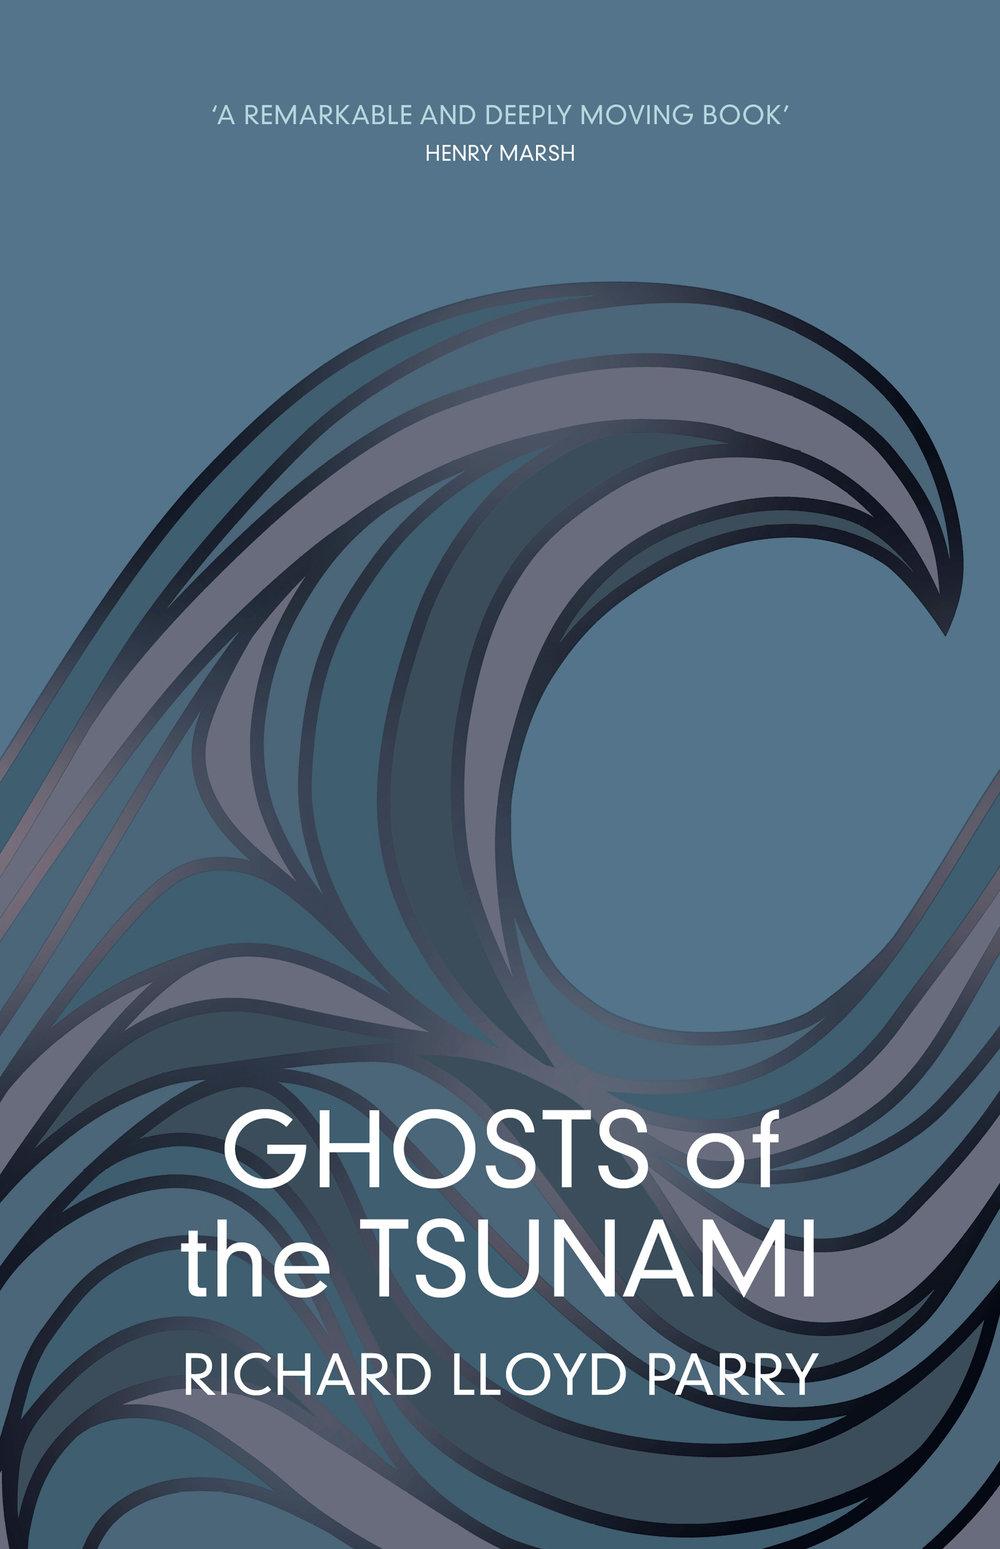 Ghosts of the Tsunami Richard Lloyd Parry.jpg